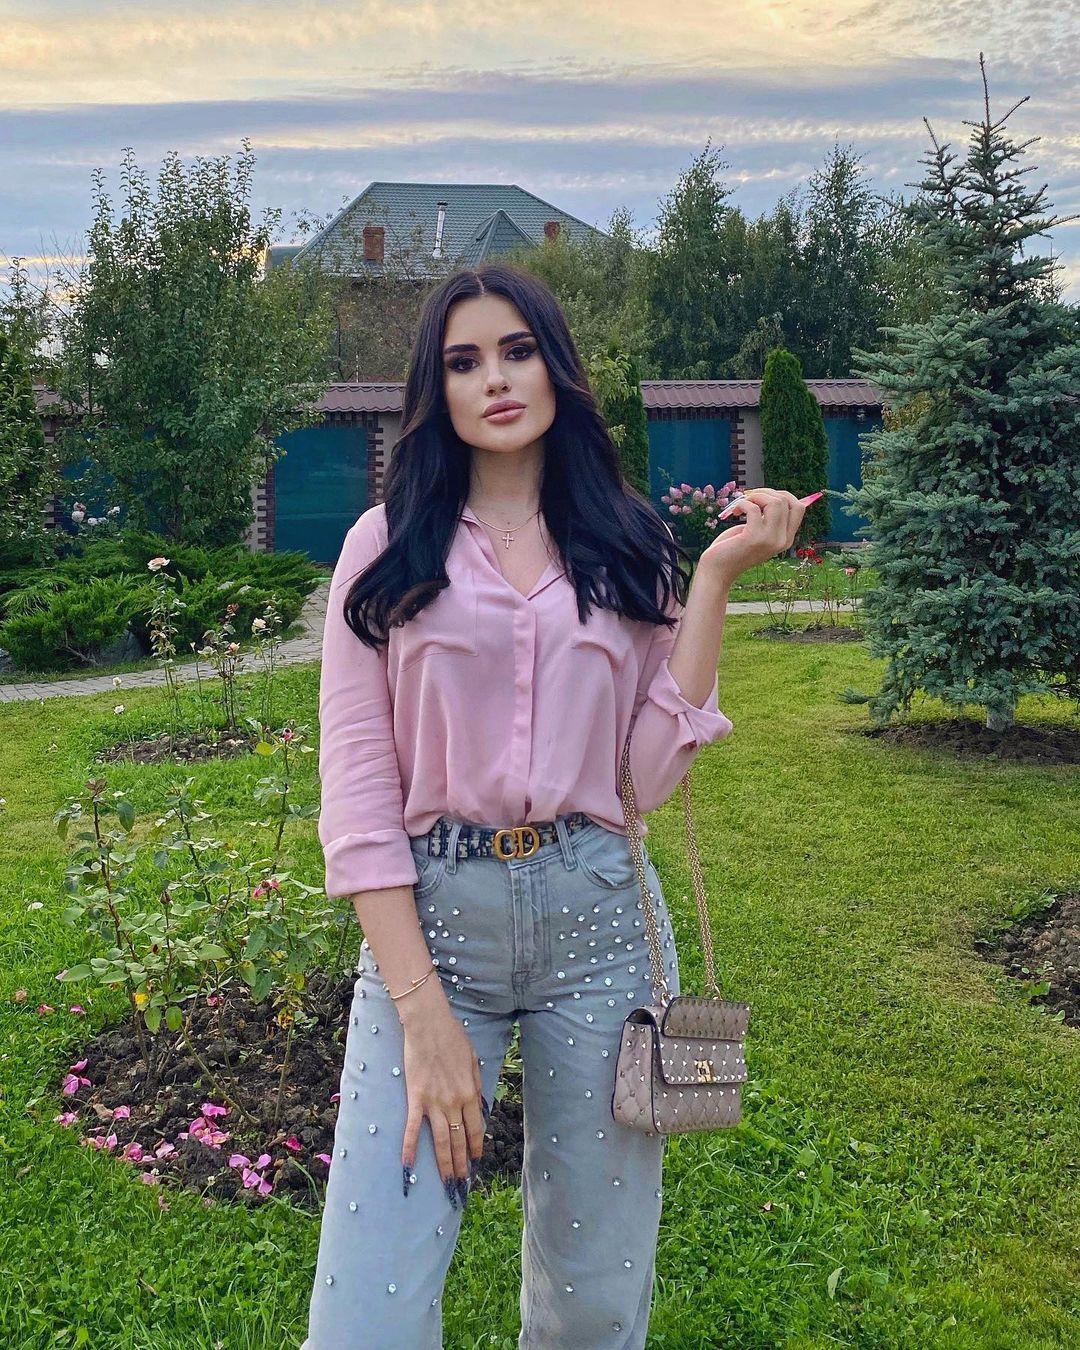 Karina-Arakelyan-Wallpapers-Insta-Fit-Bio-11